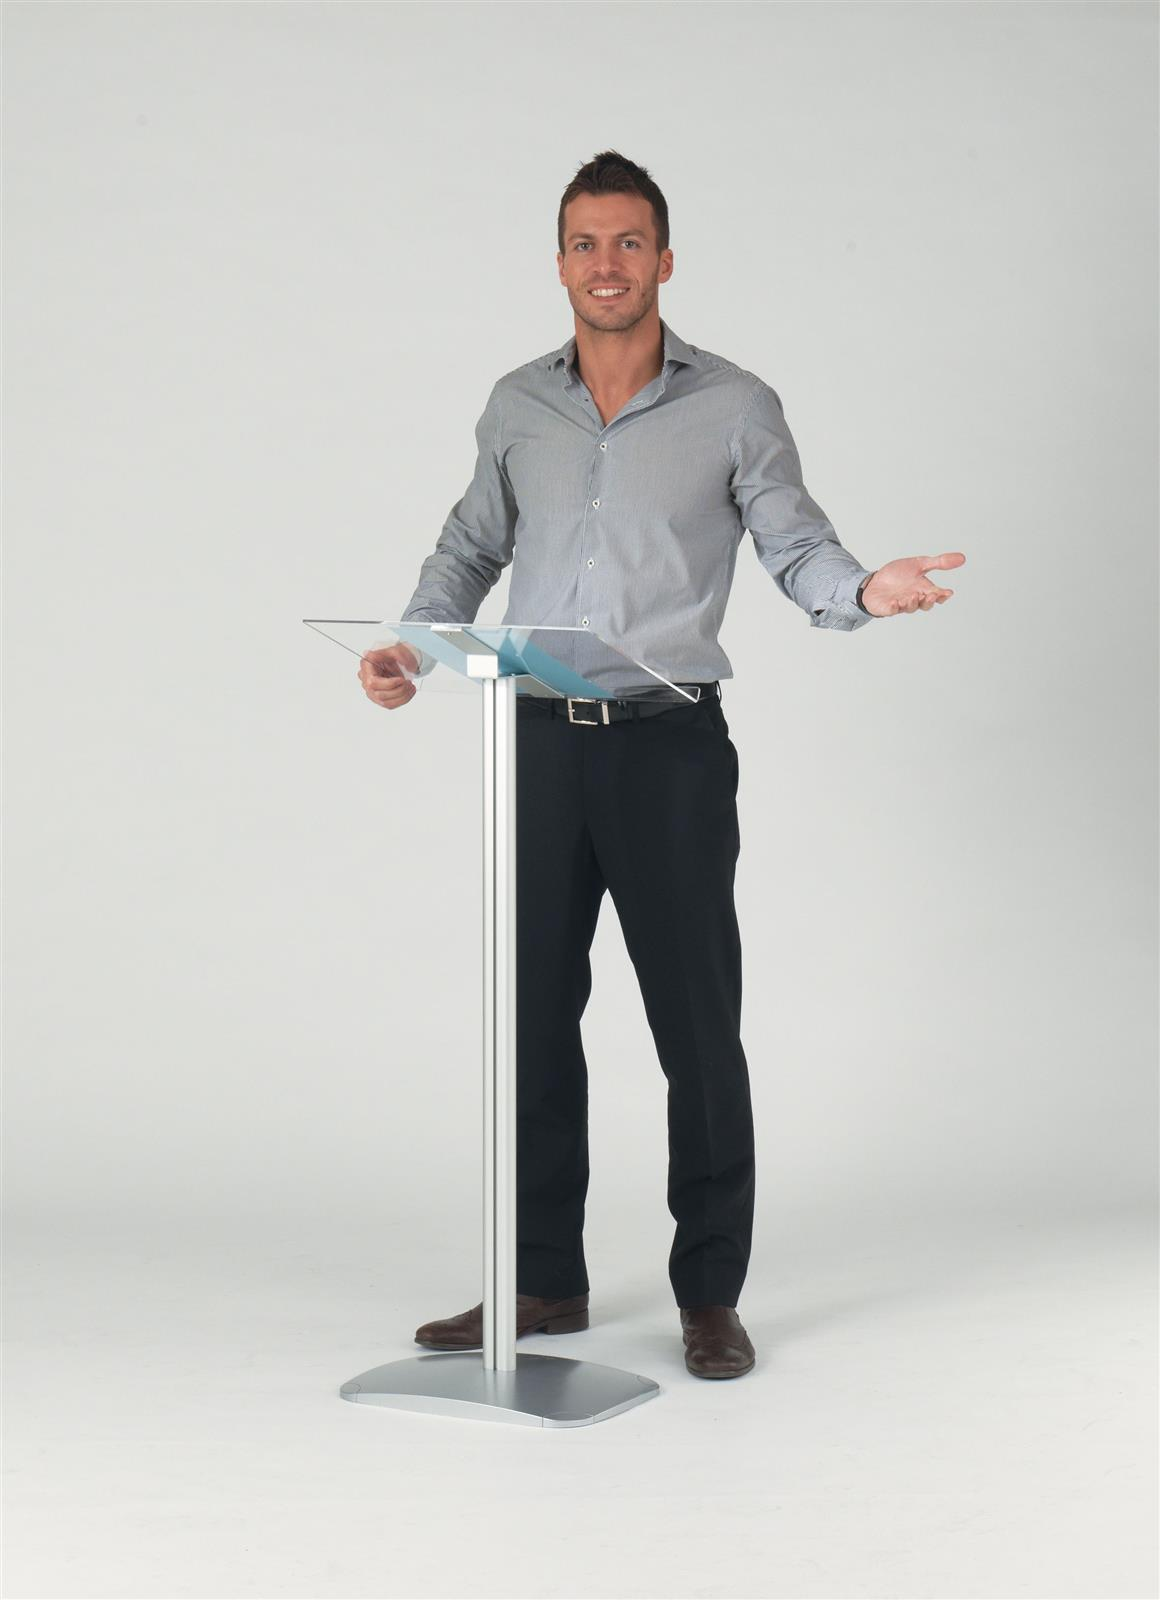 Acrylic Top Lectern - Floorstanding